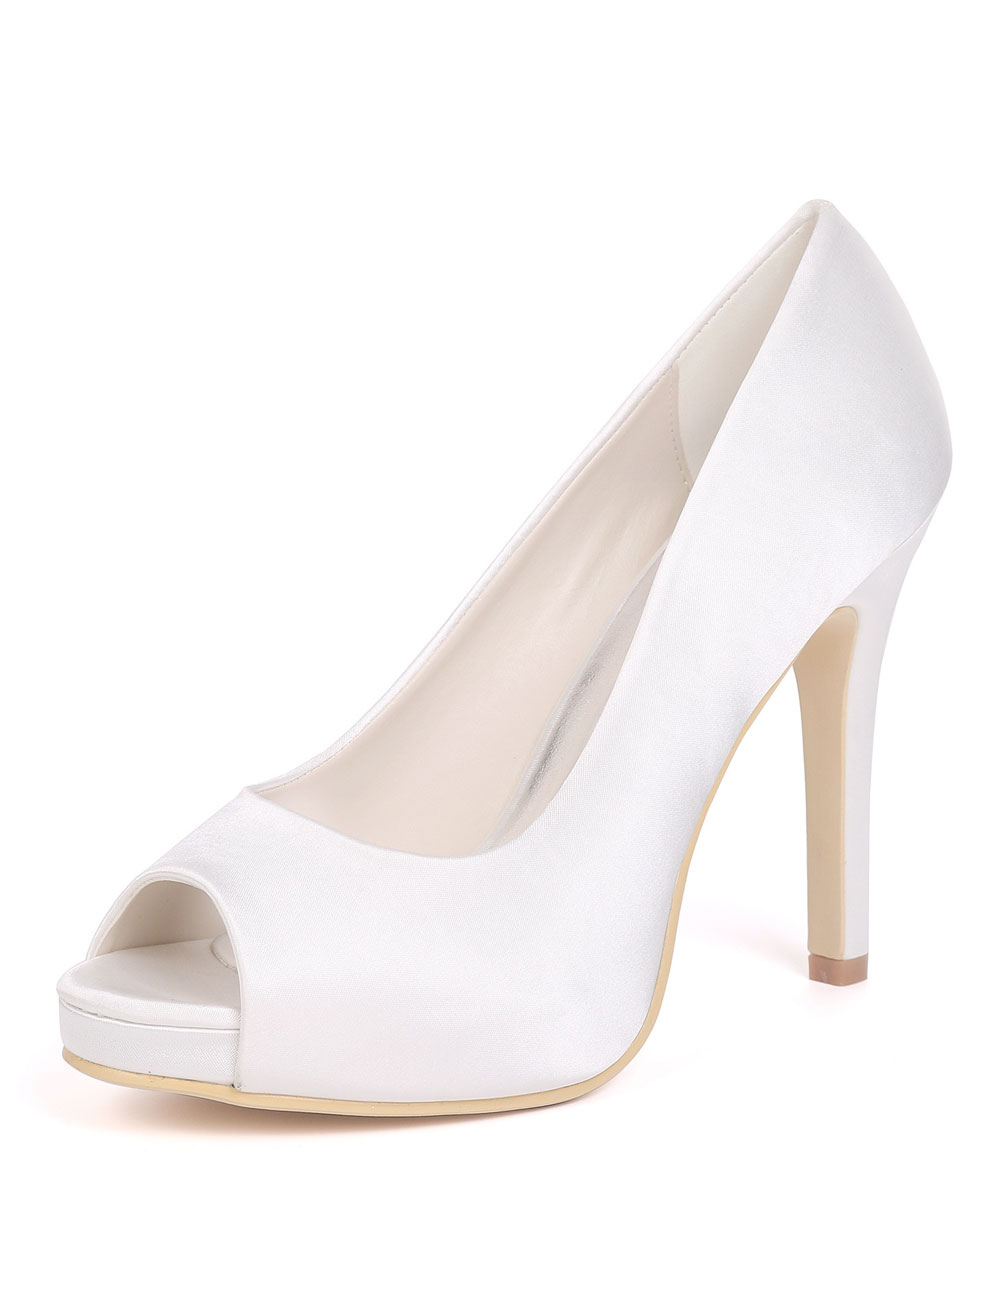 Satin Hochzeit Schuhe Lila Peep Toe Hochzeit Gast Schuhe Frauen High Heels